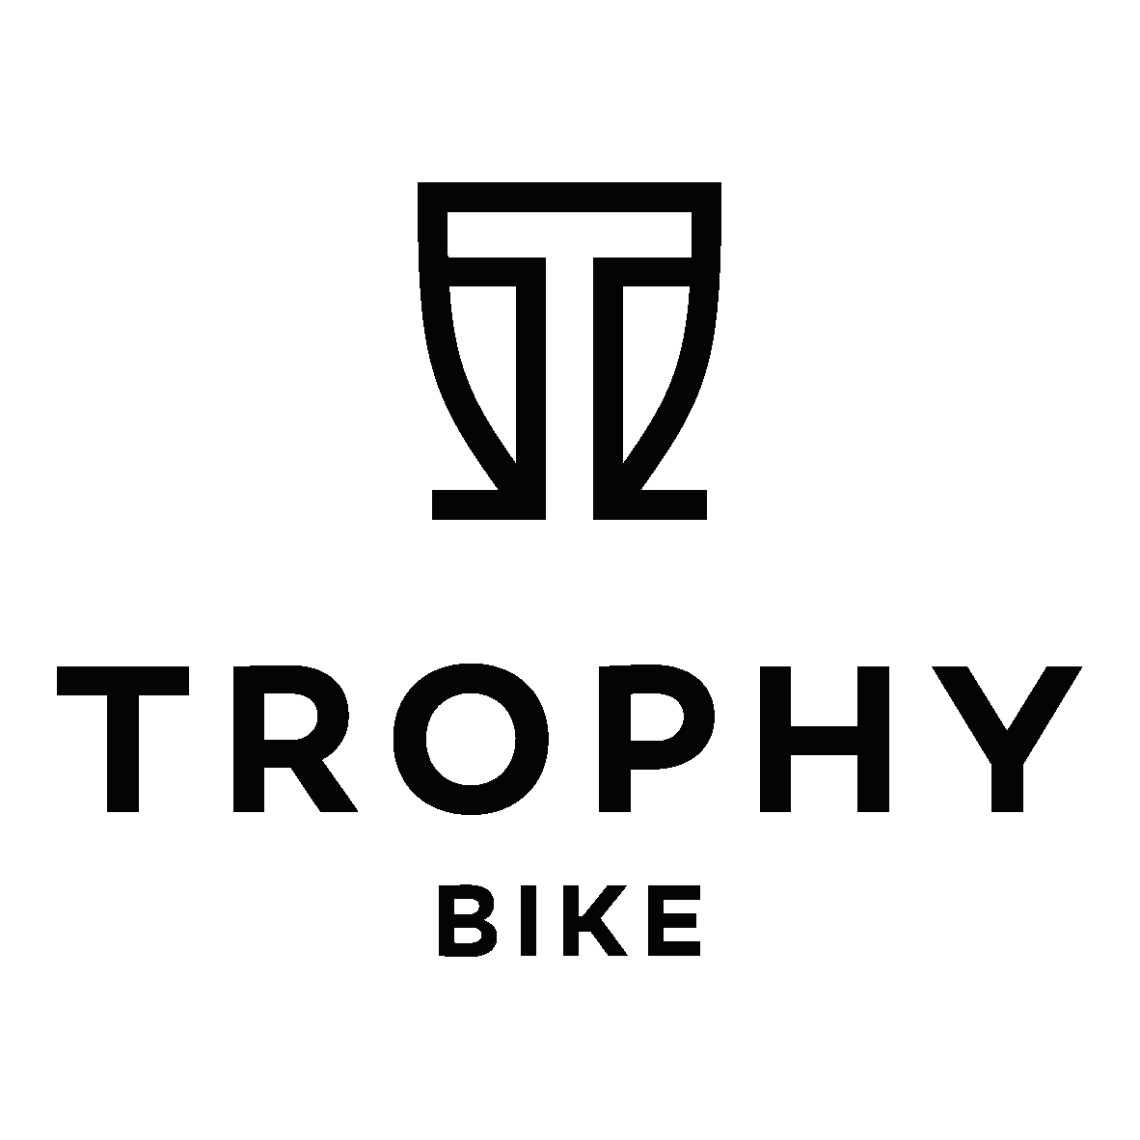 Trophy Bike